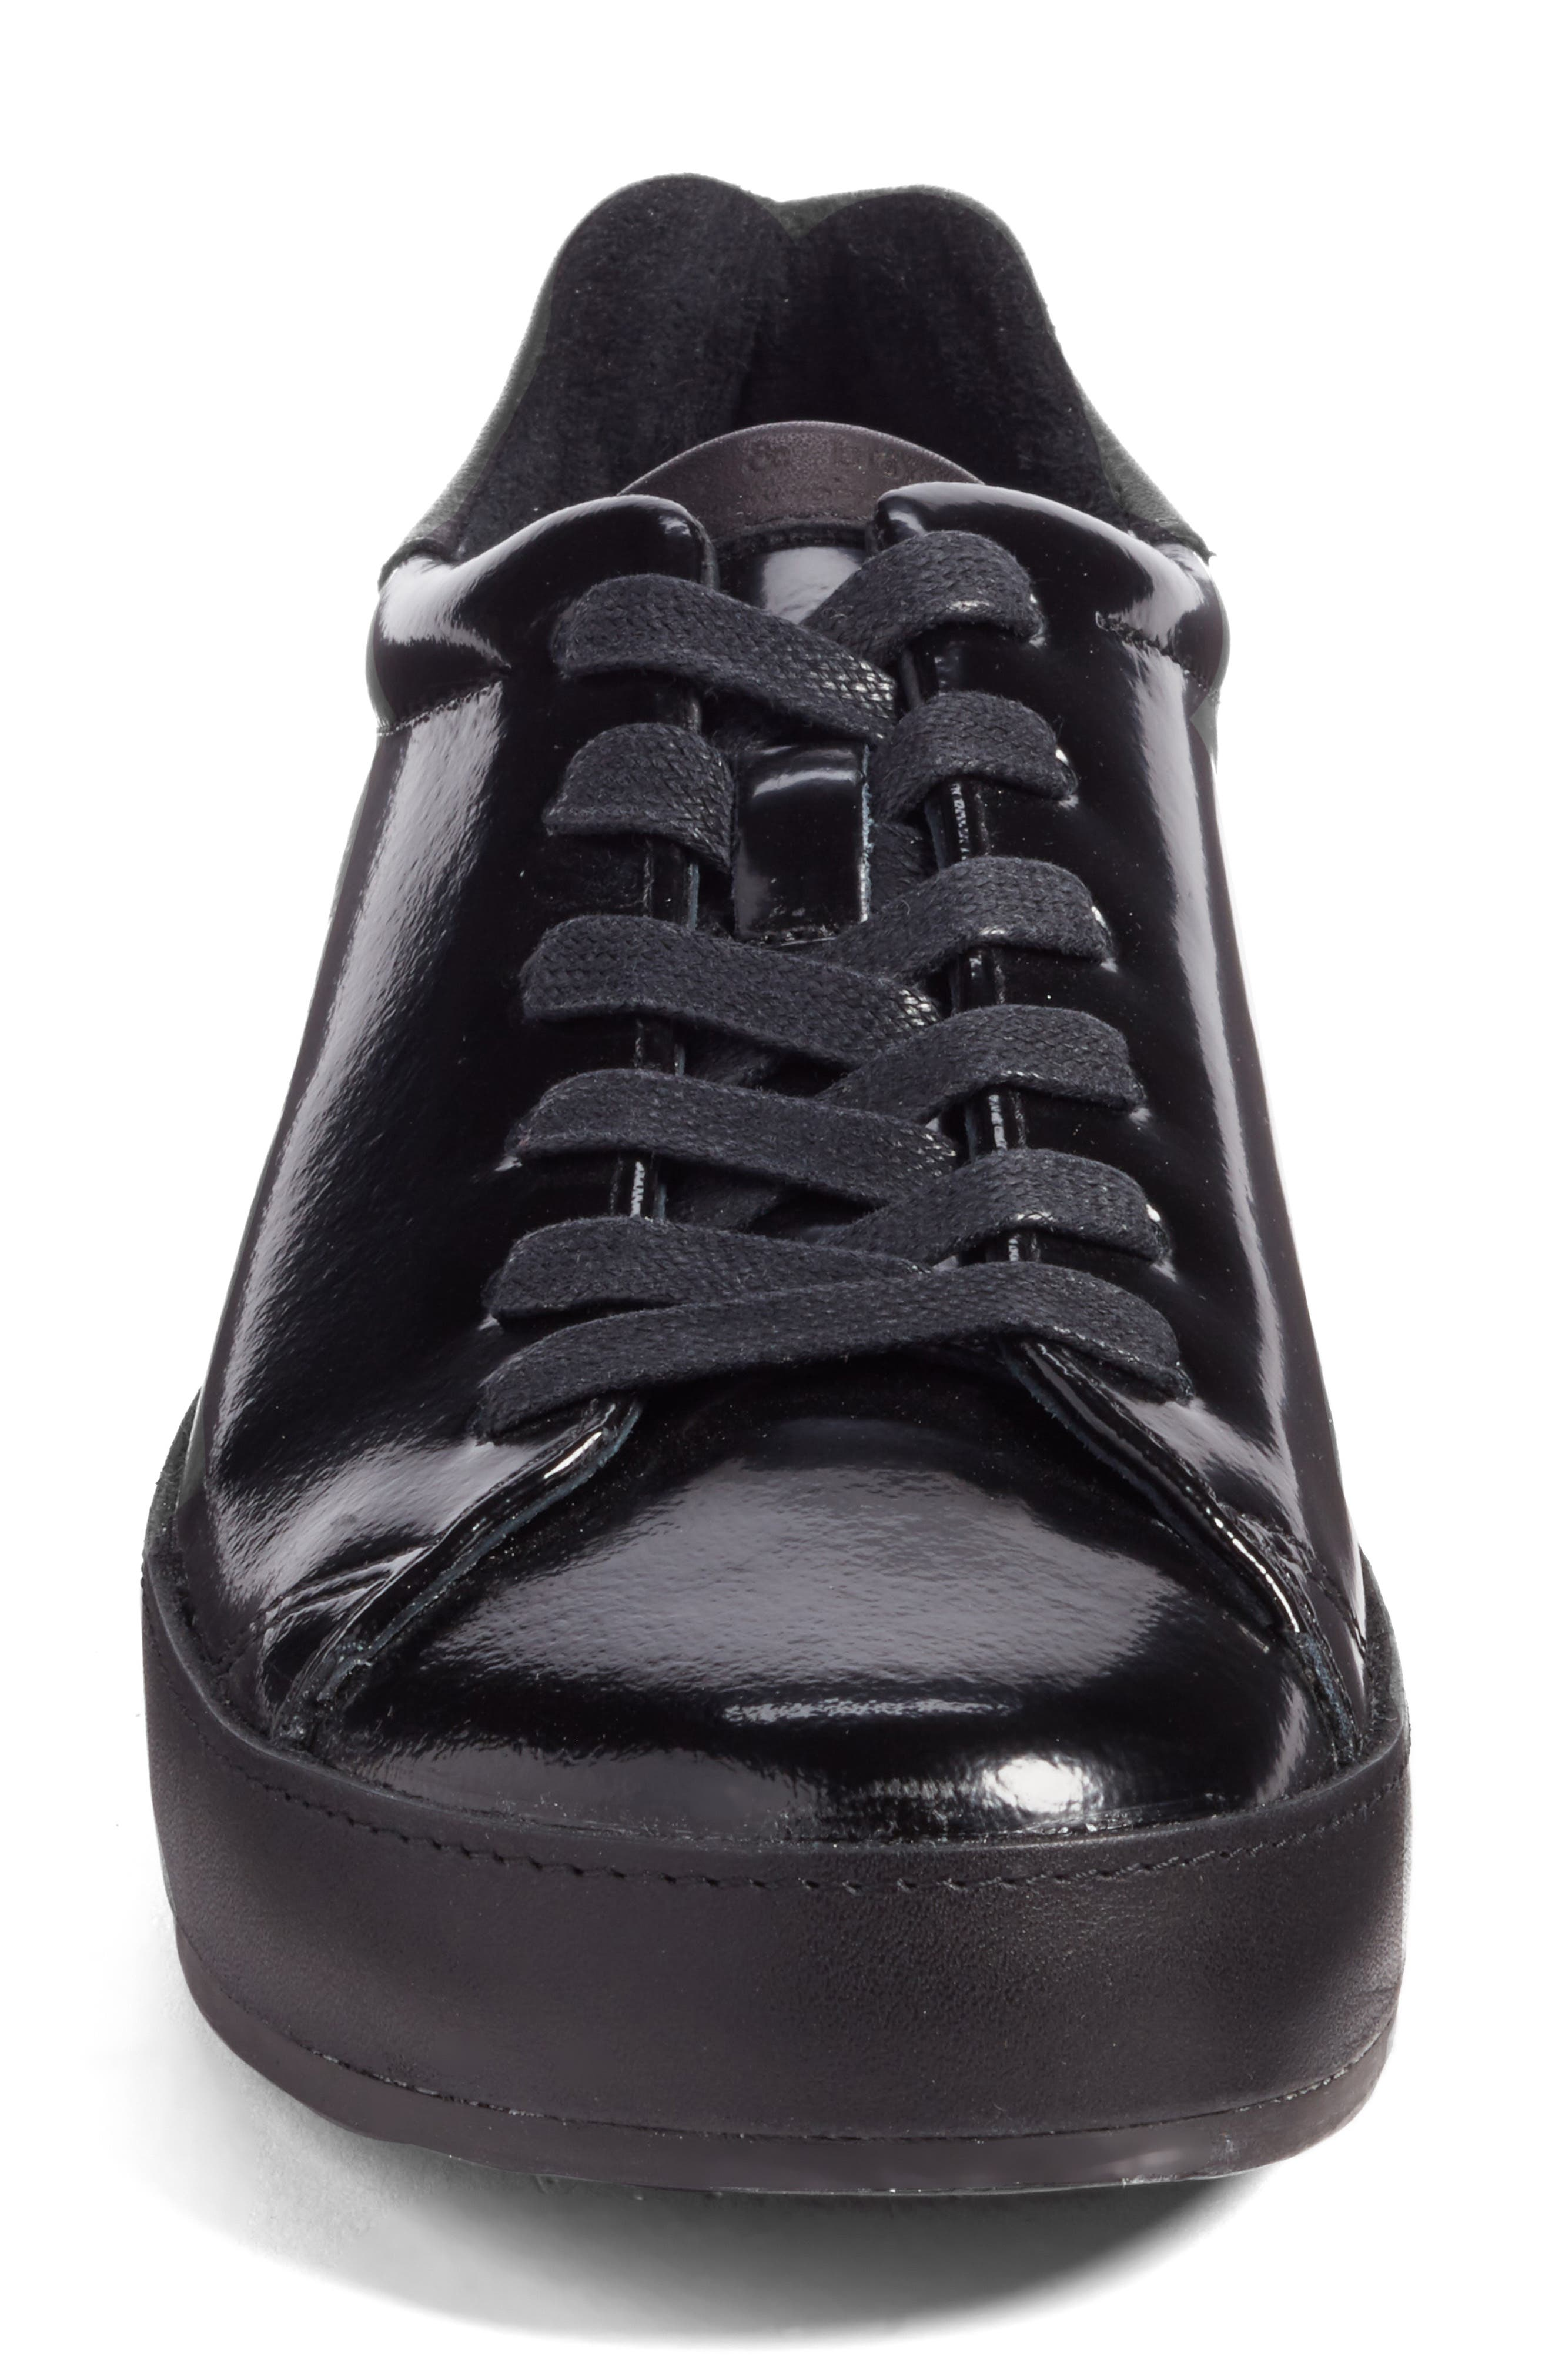 RB1 Low-Top Sneaker,                             Alternate thumbnail 4, color,                             001